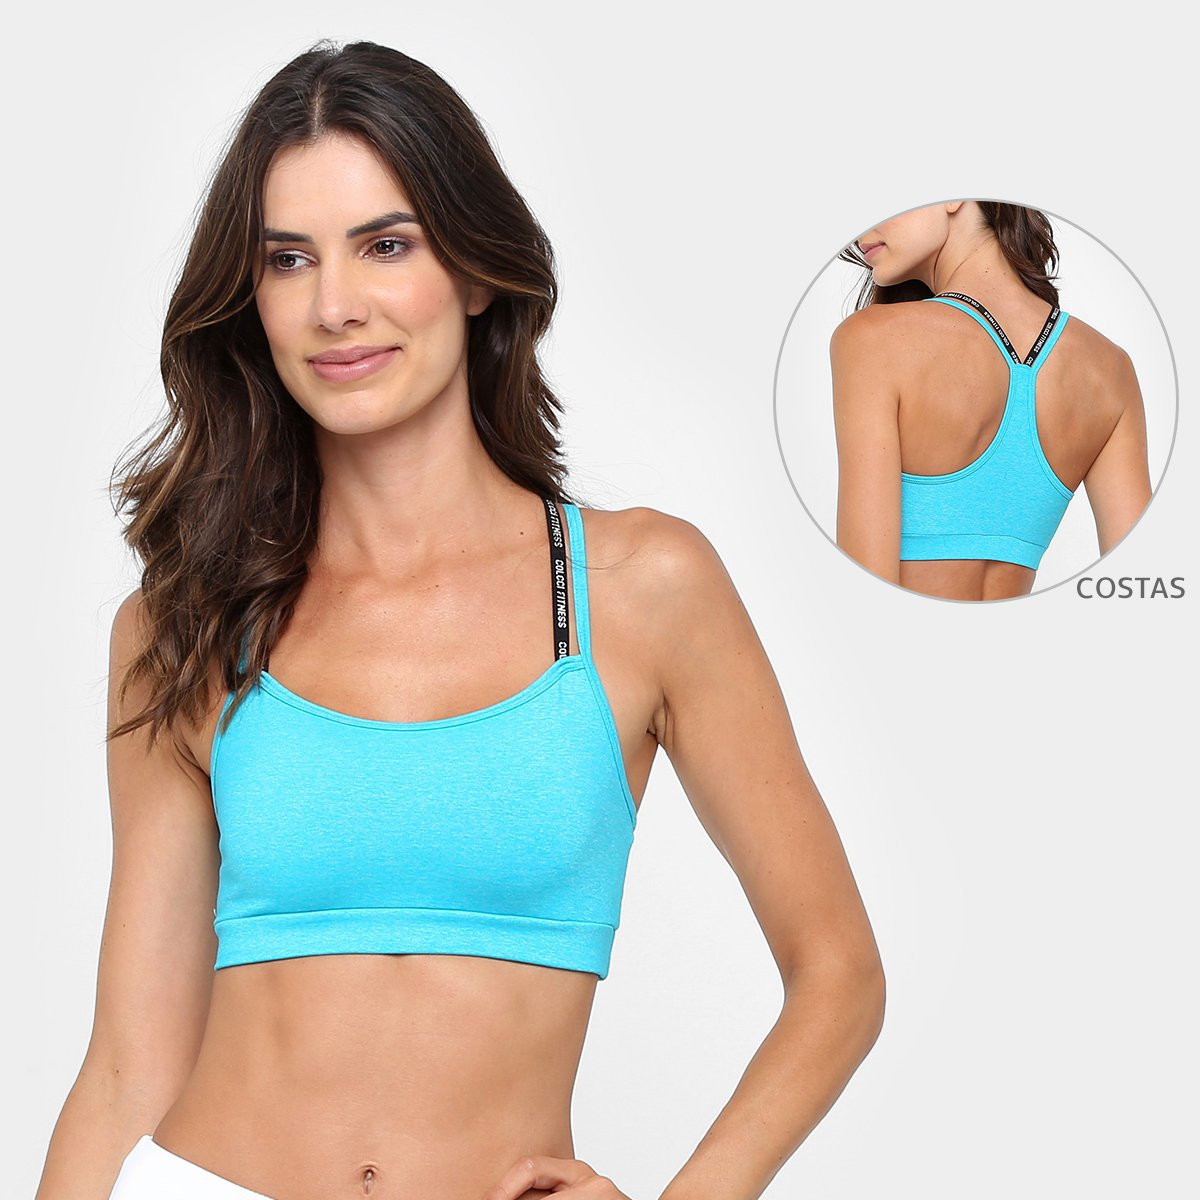 e50749bda Top Colcci Fitness Feminino - Compre Agora | Allianz Parque Shop